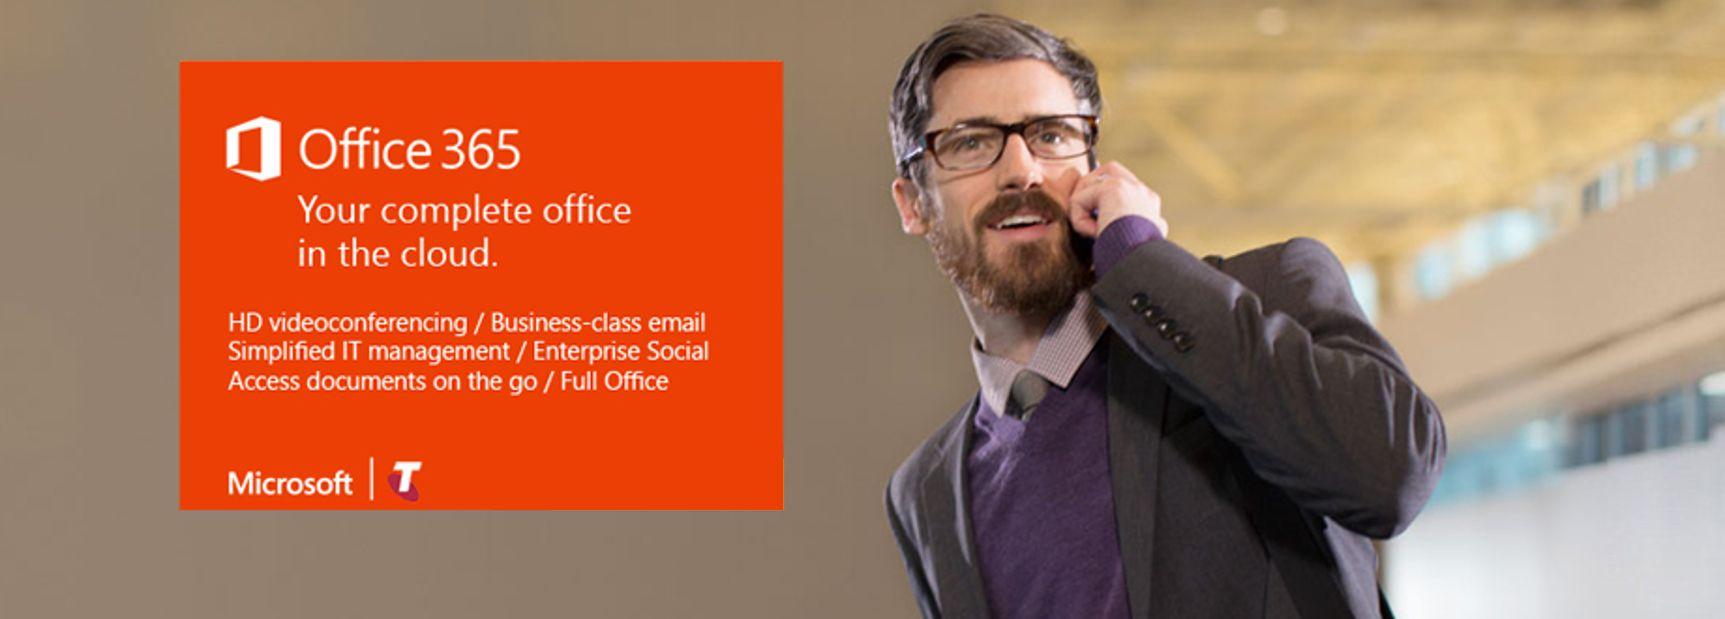 Brisbane_Office_365_Services